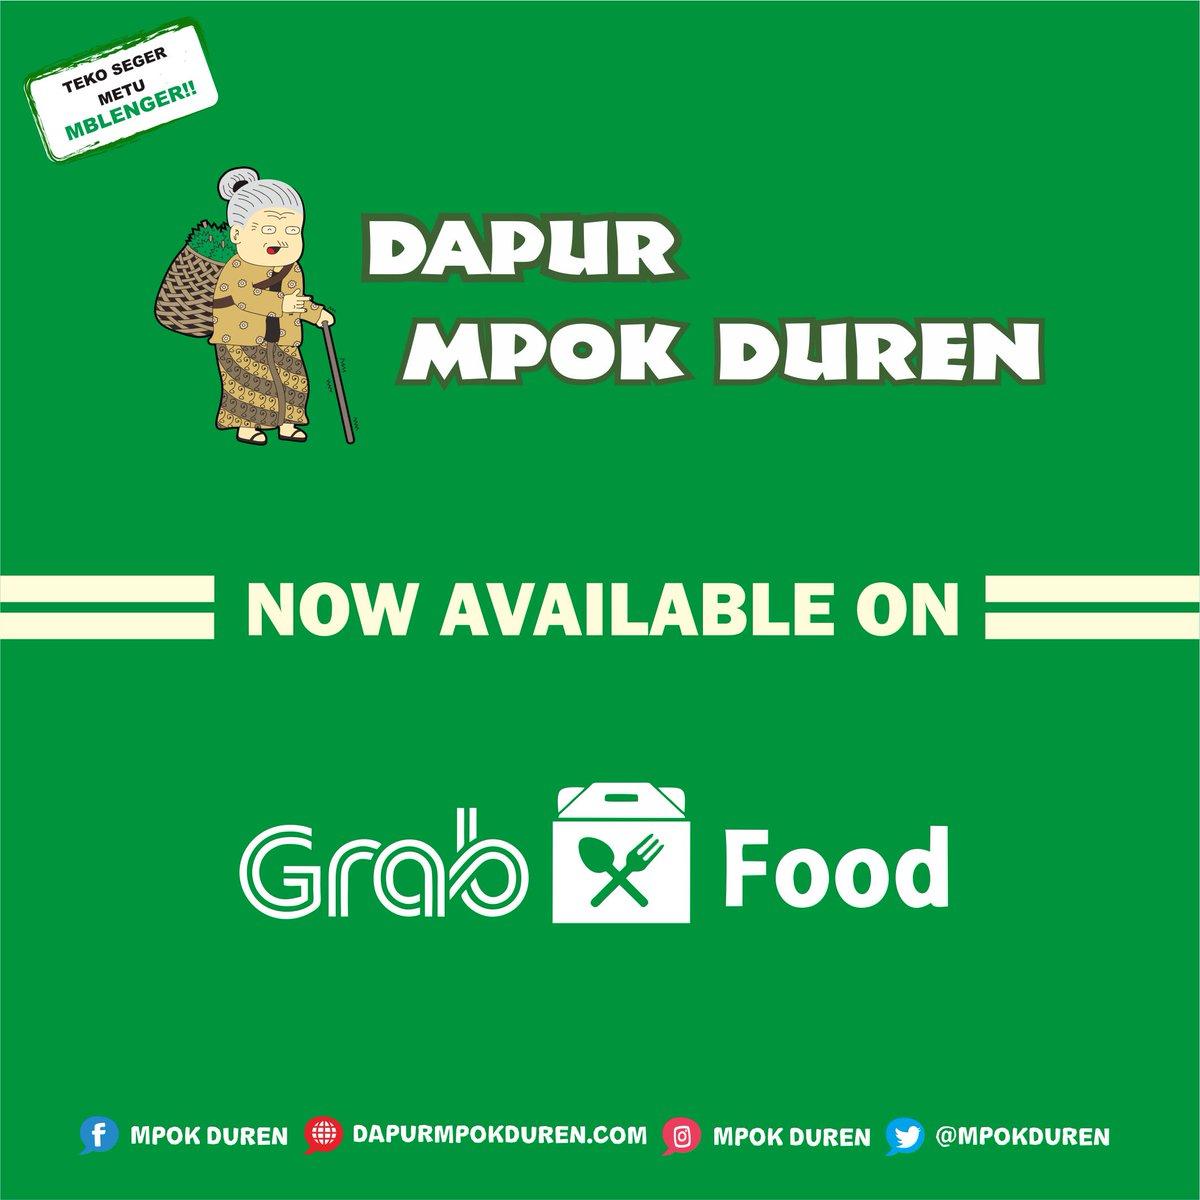 Dapur Mpok Duren On Twitter Now Available Pesan Antar Grab Food